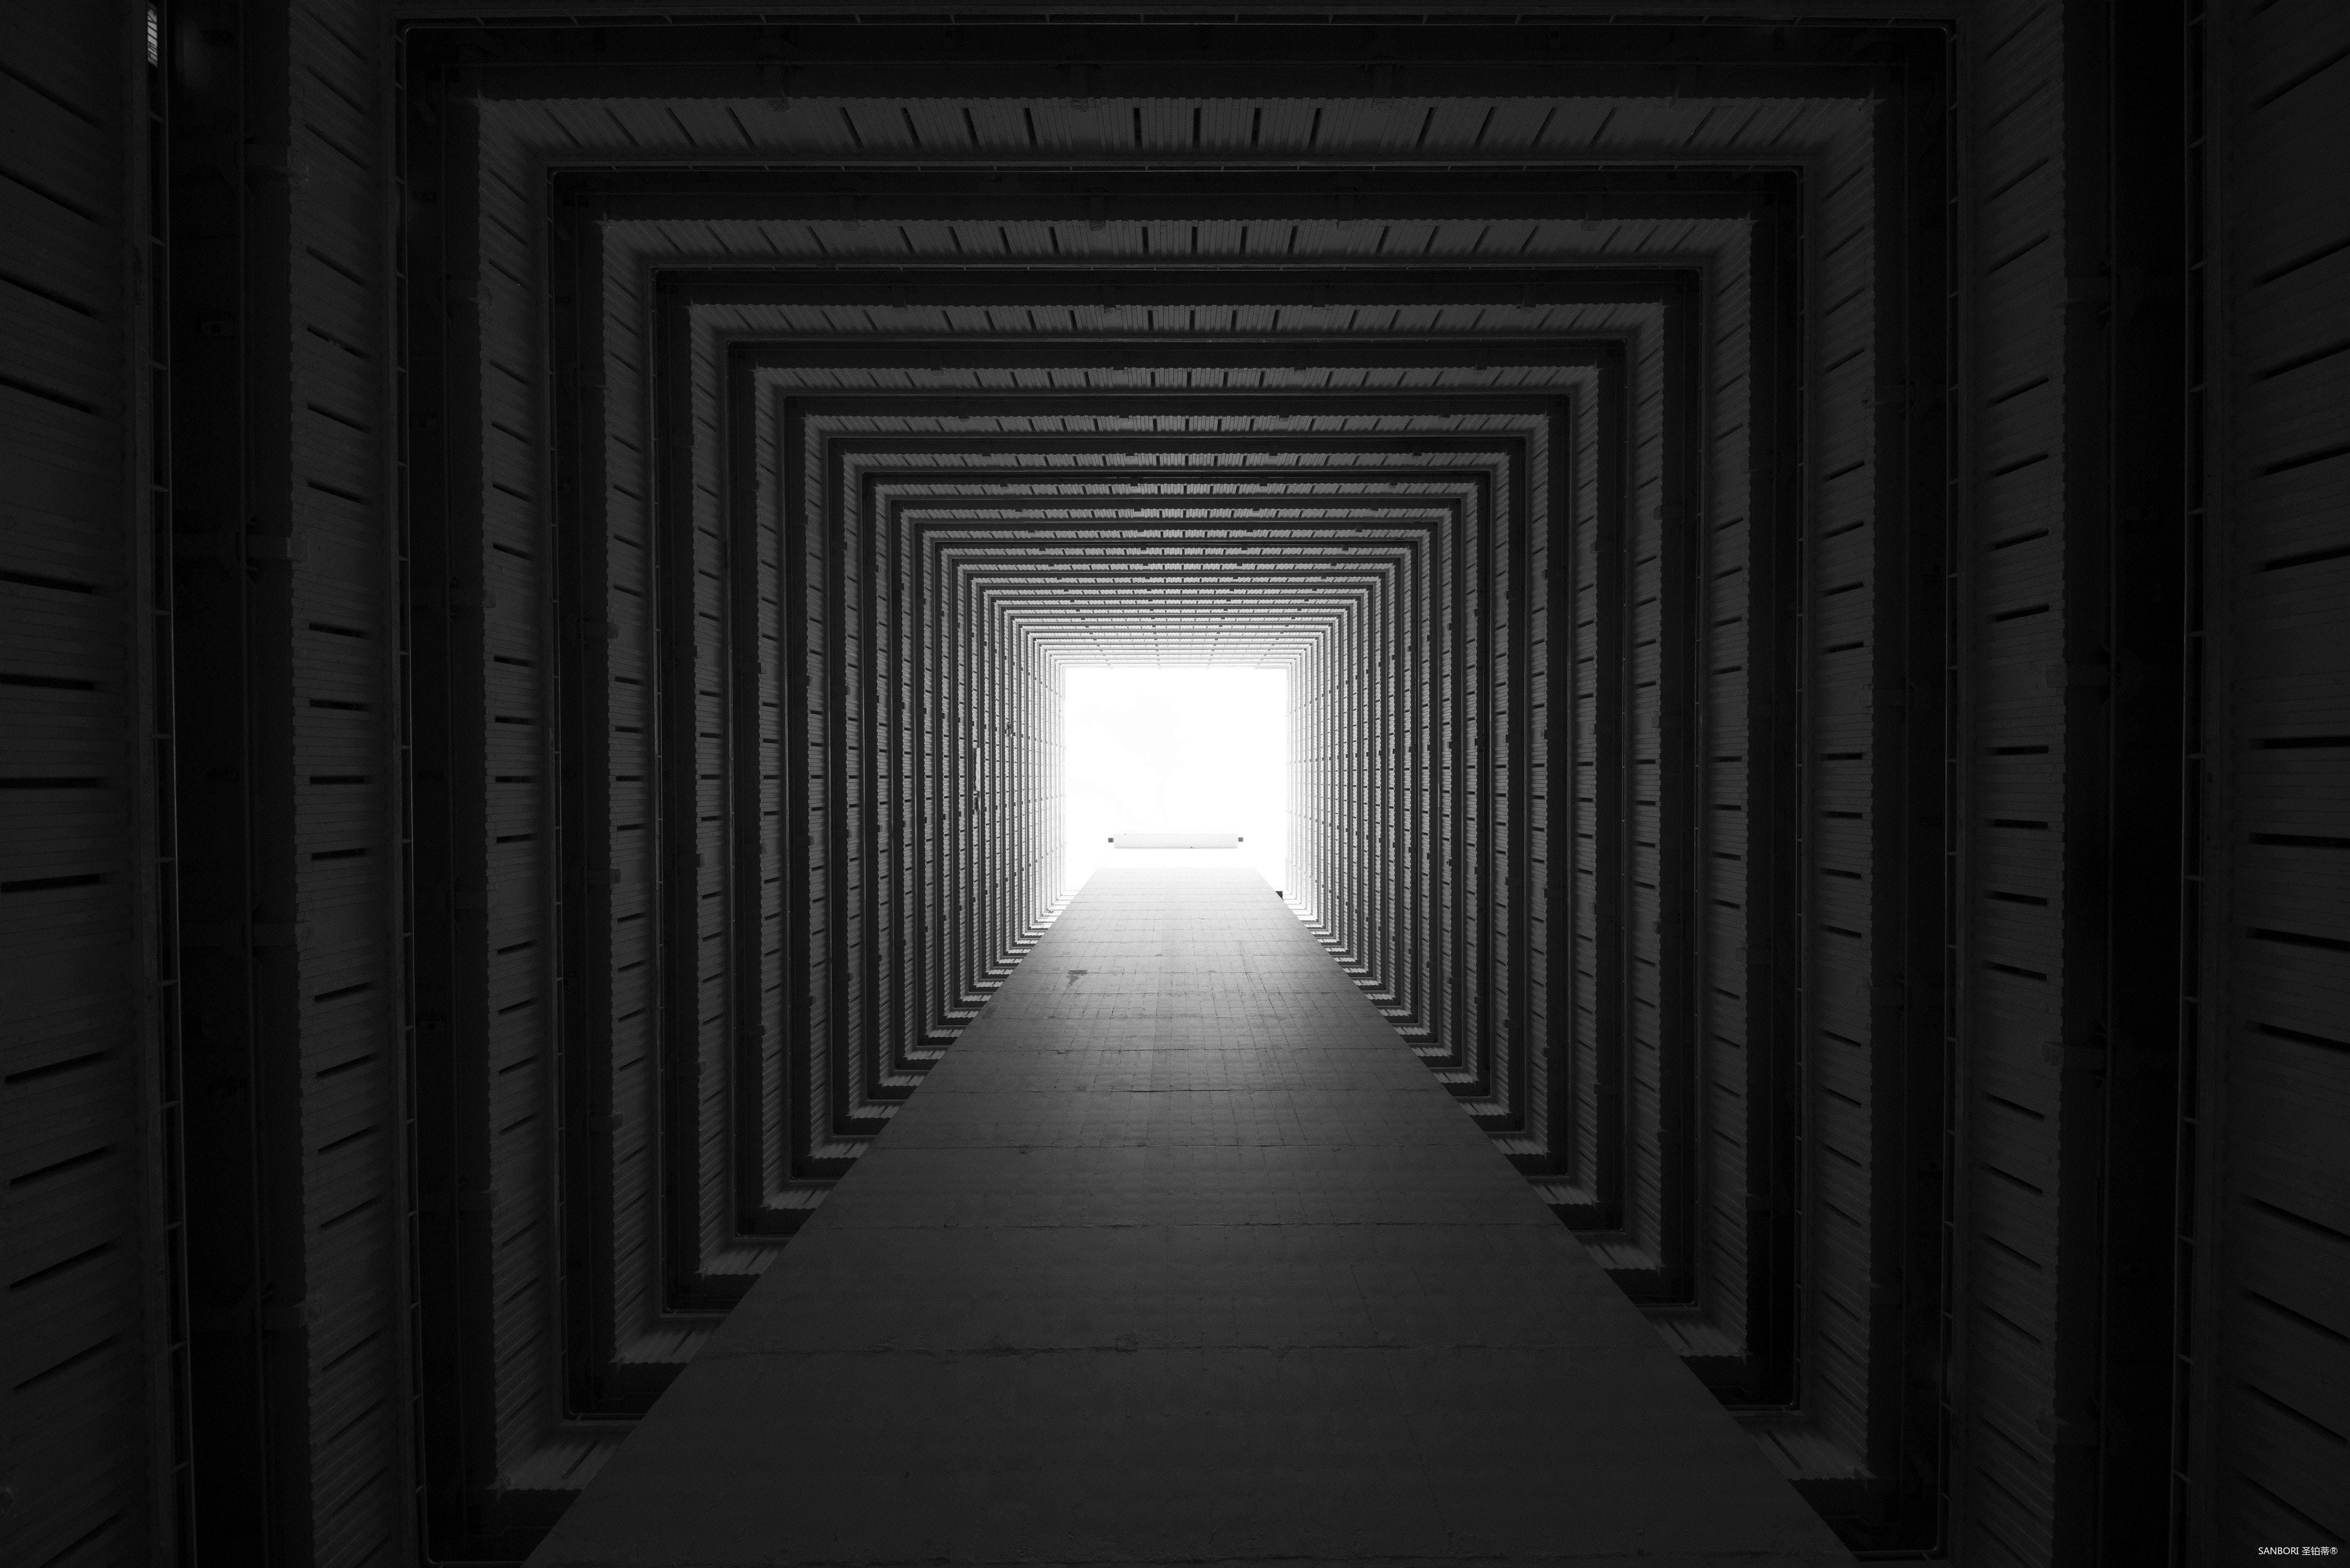 concrete-tunnel-3043424.jpg